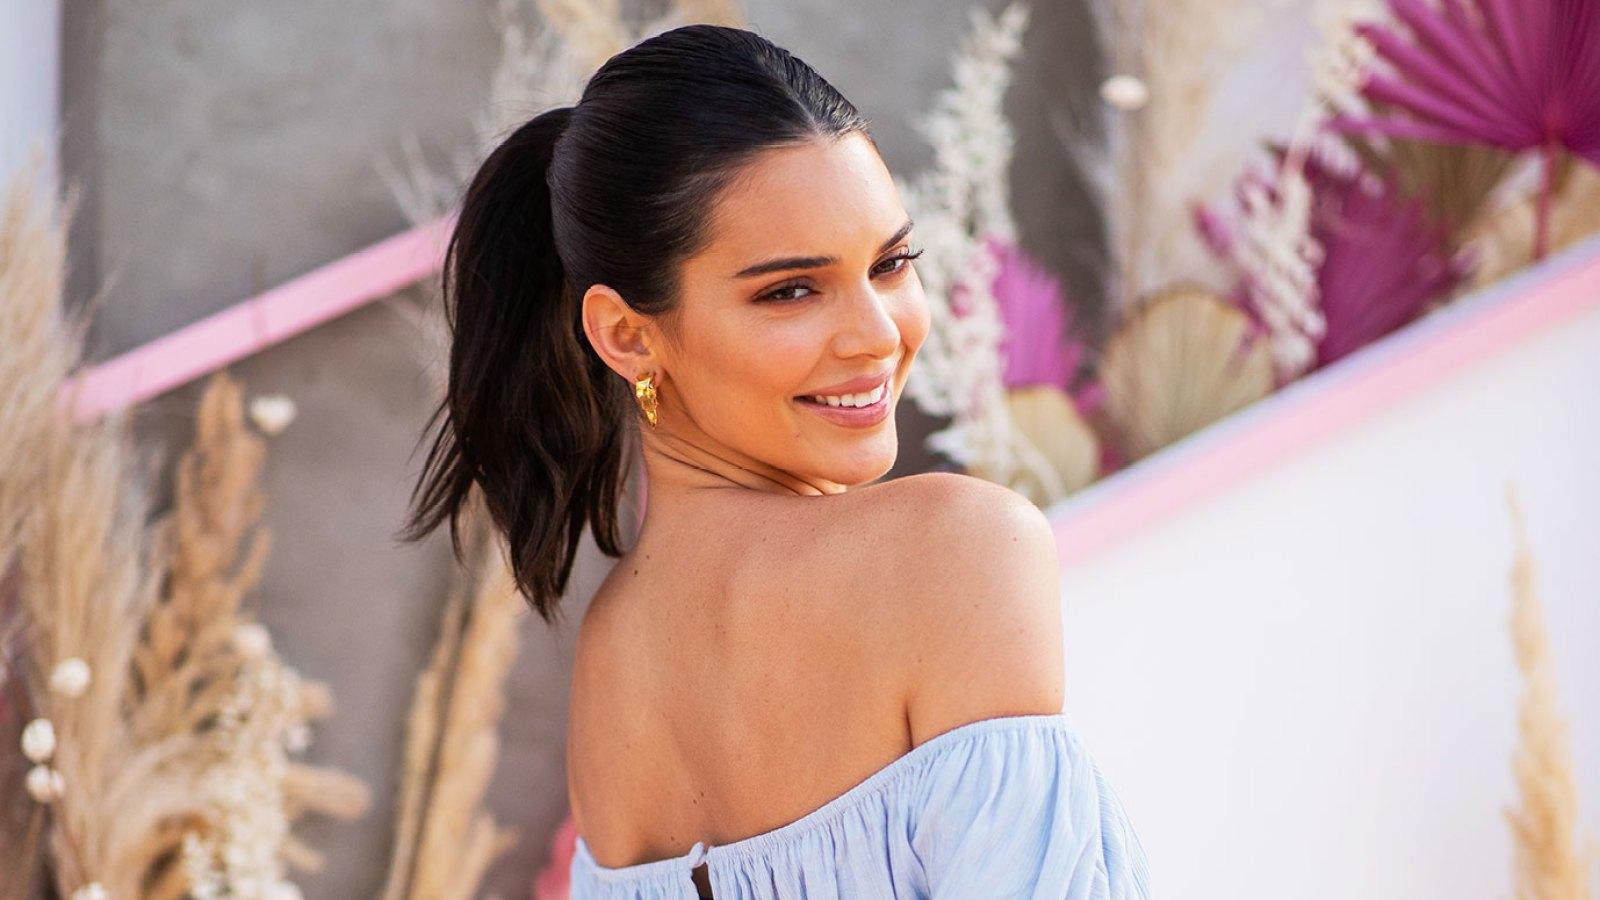 b1001b646ca4bf Coachella 2019 Celebrity Beauty: Kendall Jenner's Green Eyes, Glow